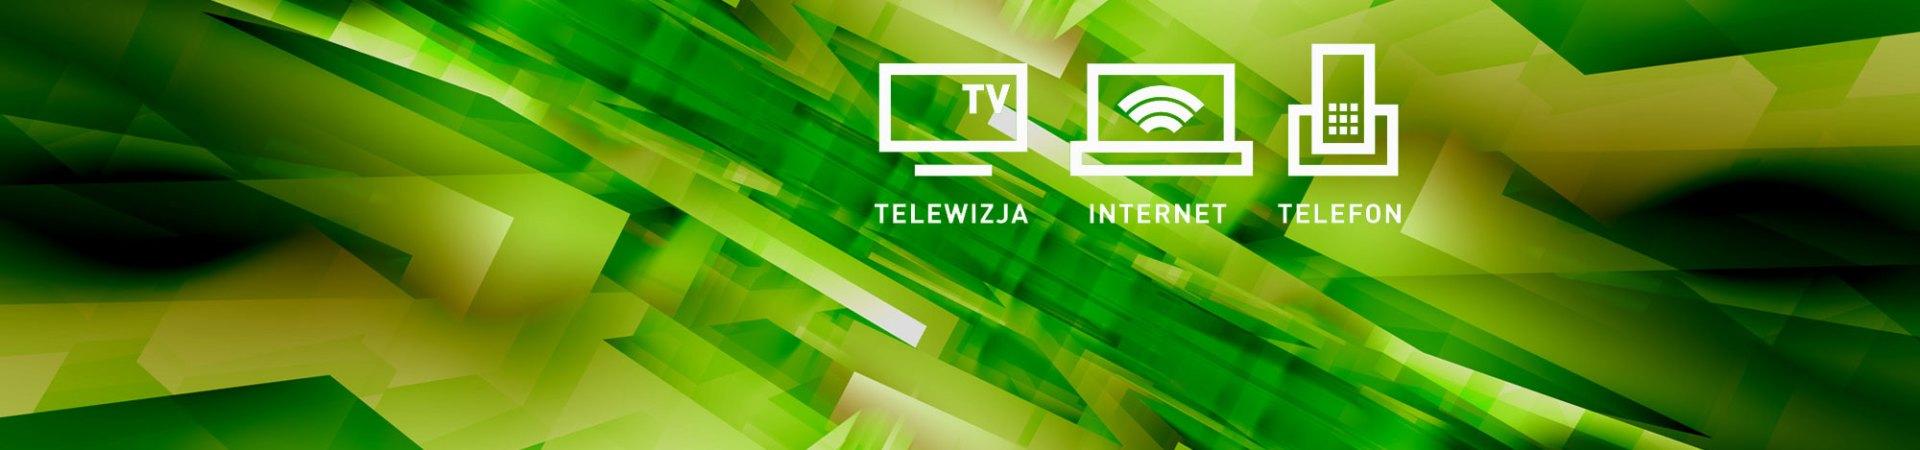 Internet + telewizja + telefon